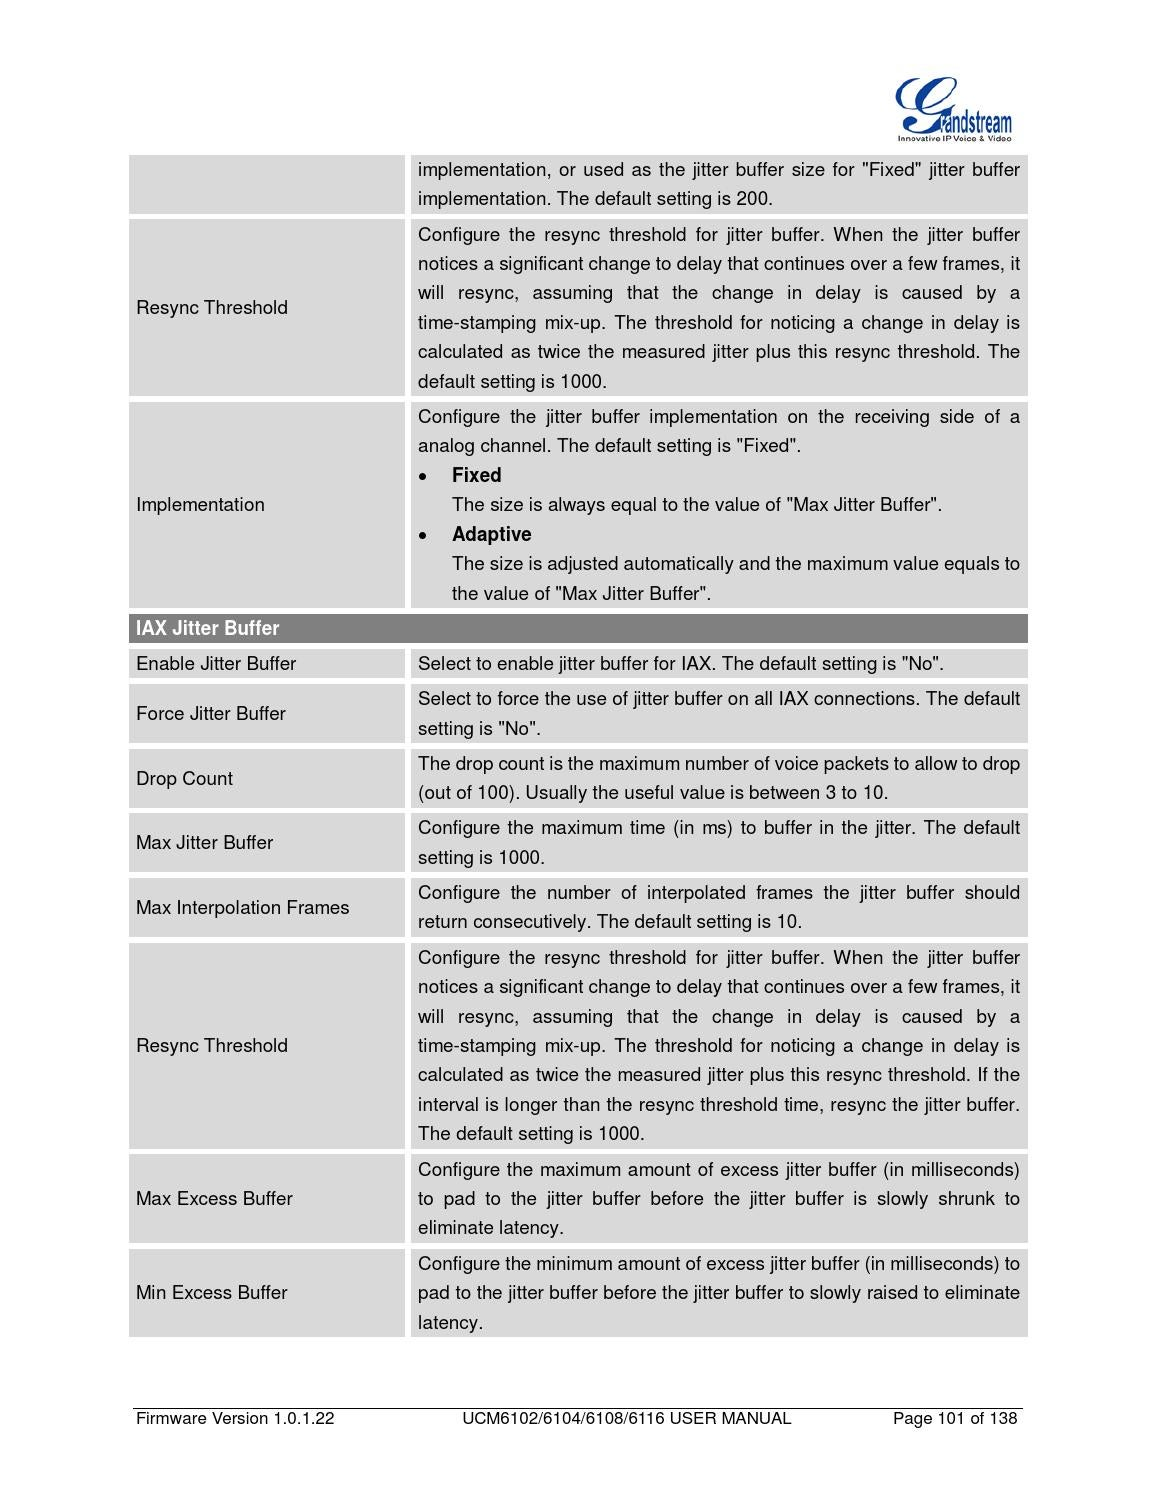 Grandstream ucm6100 user manual by Grace Telecom - issuu